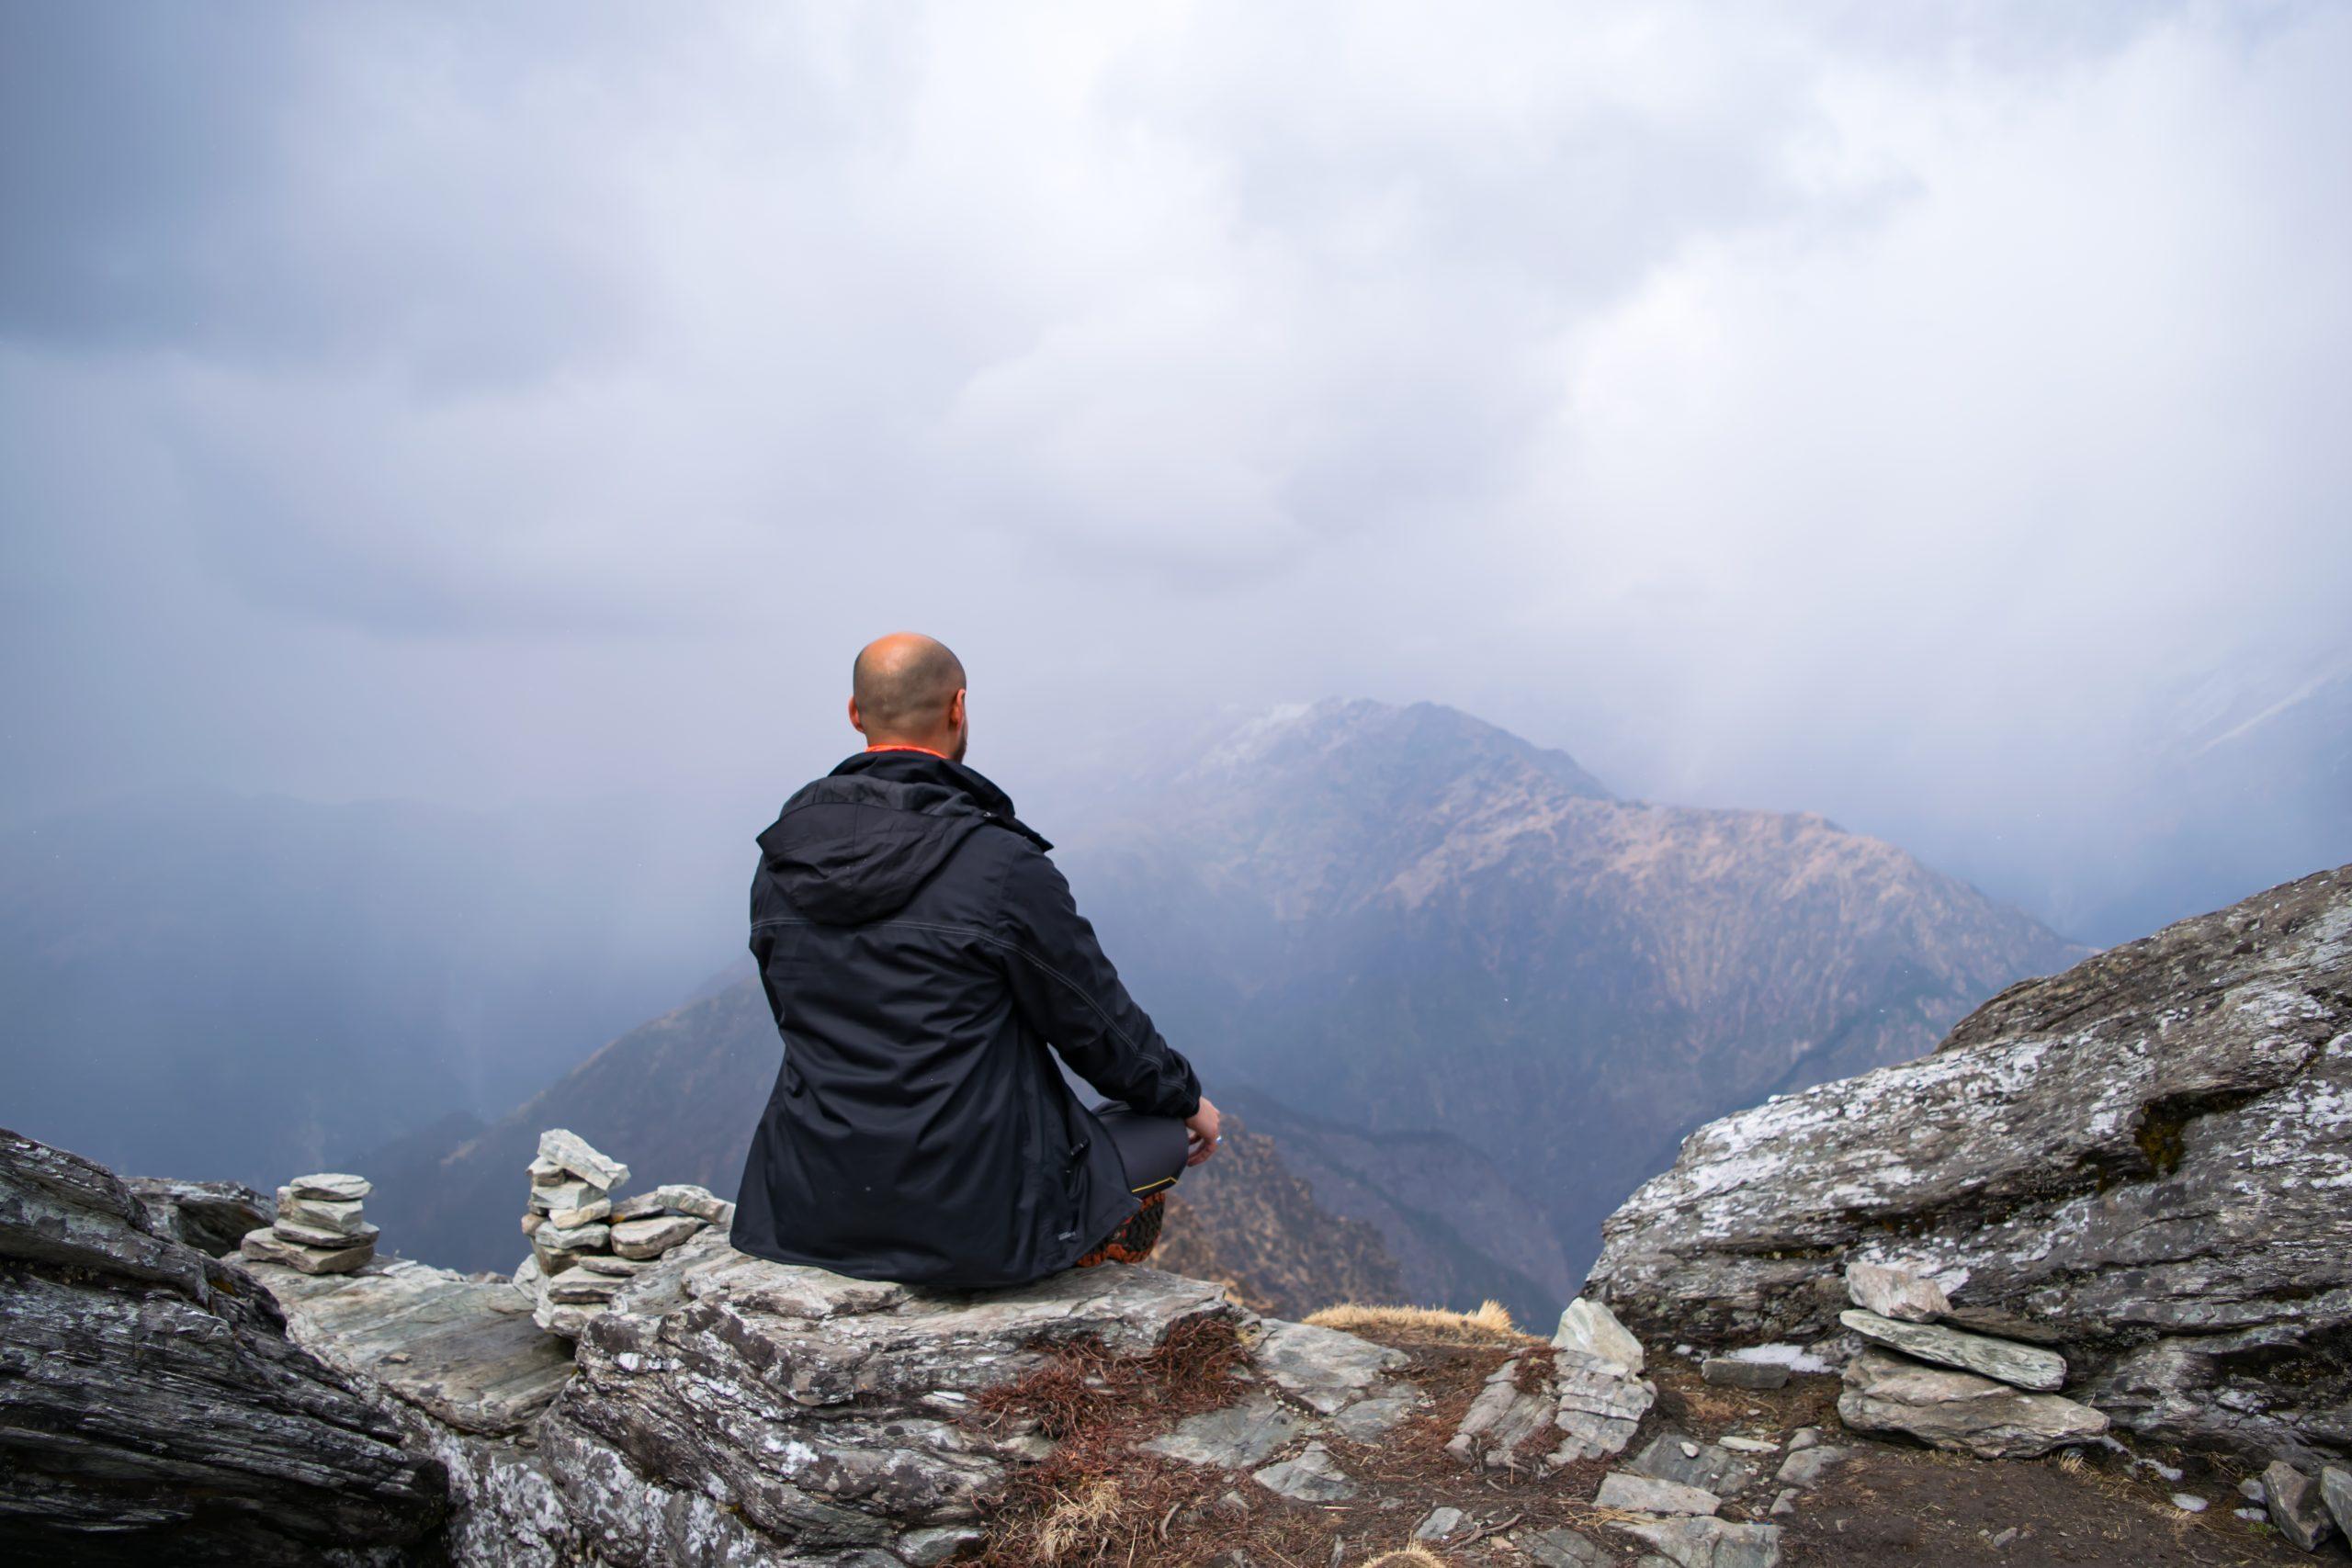 Meditation in Himalayas